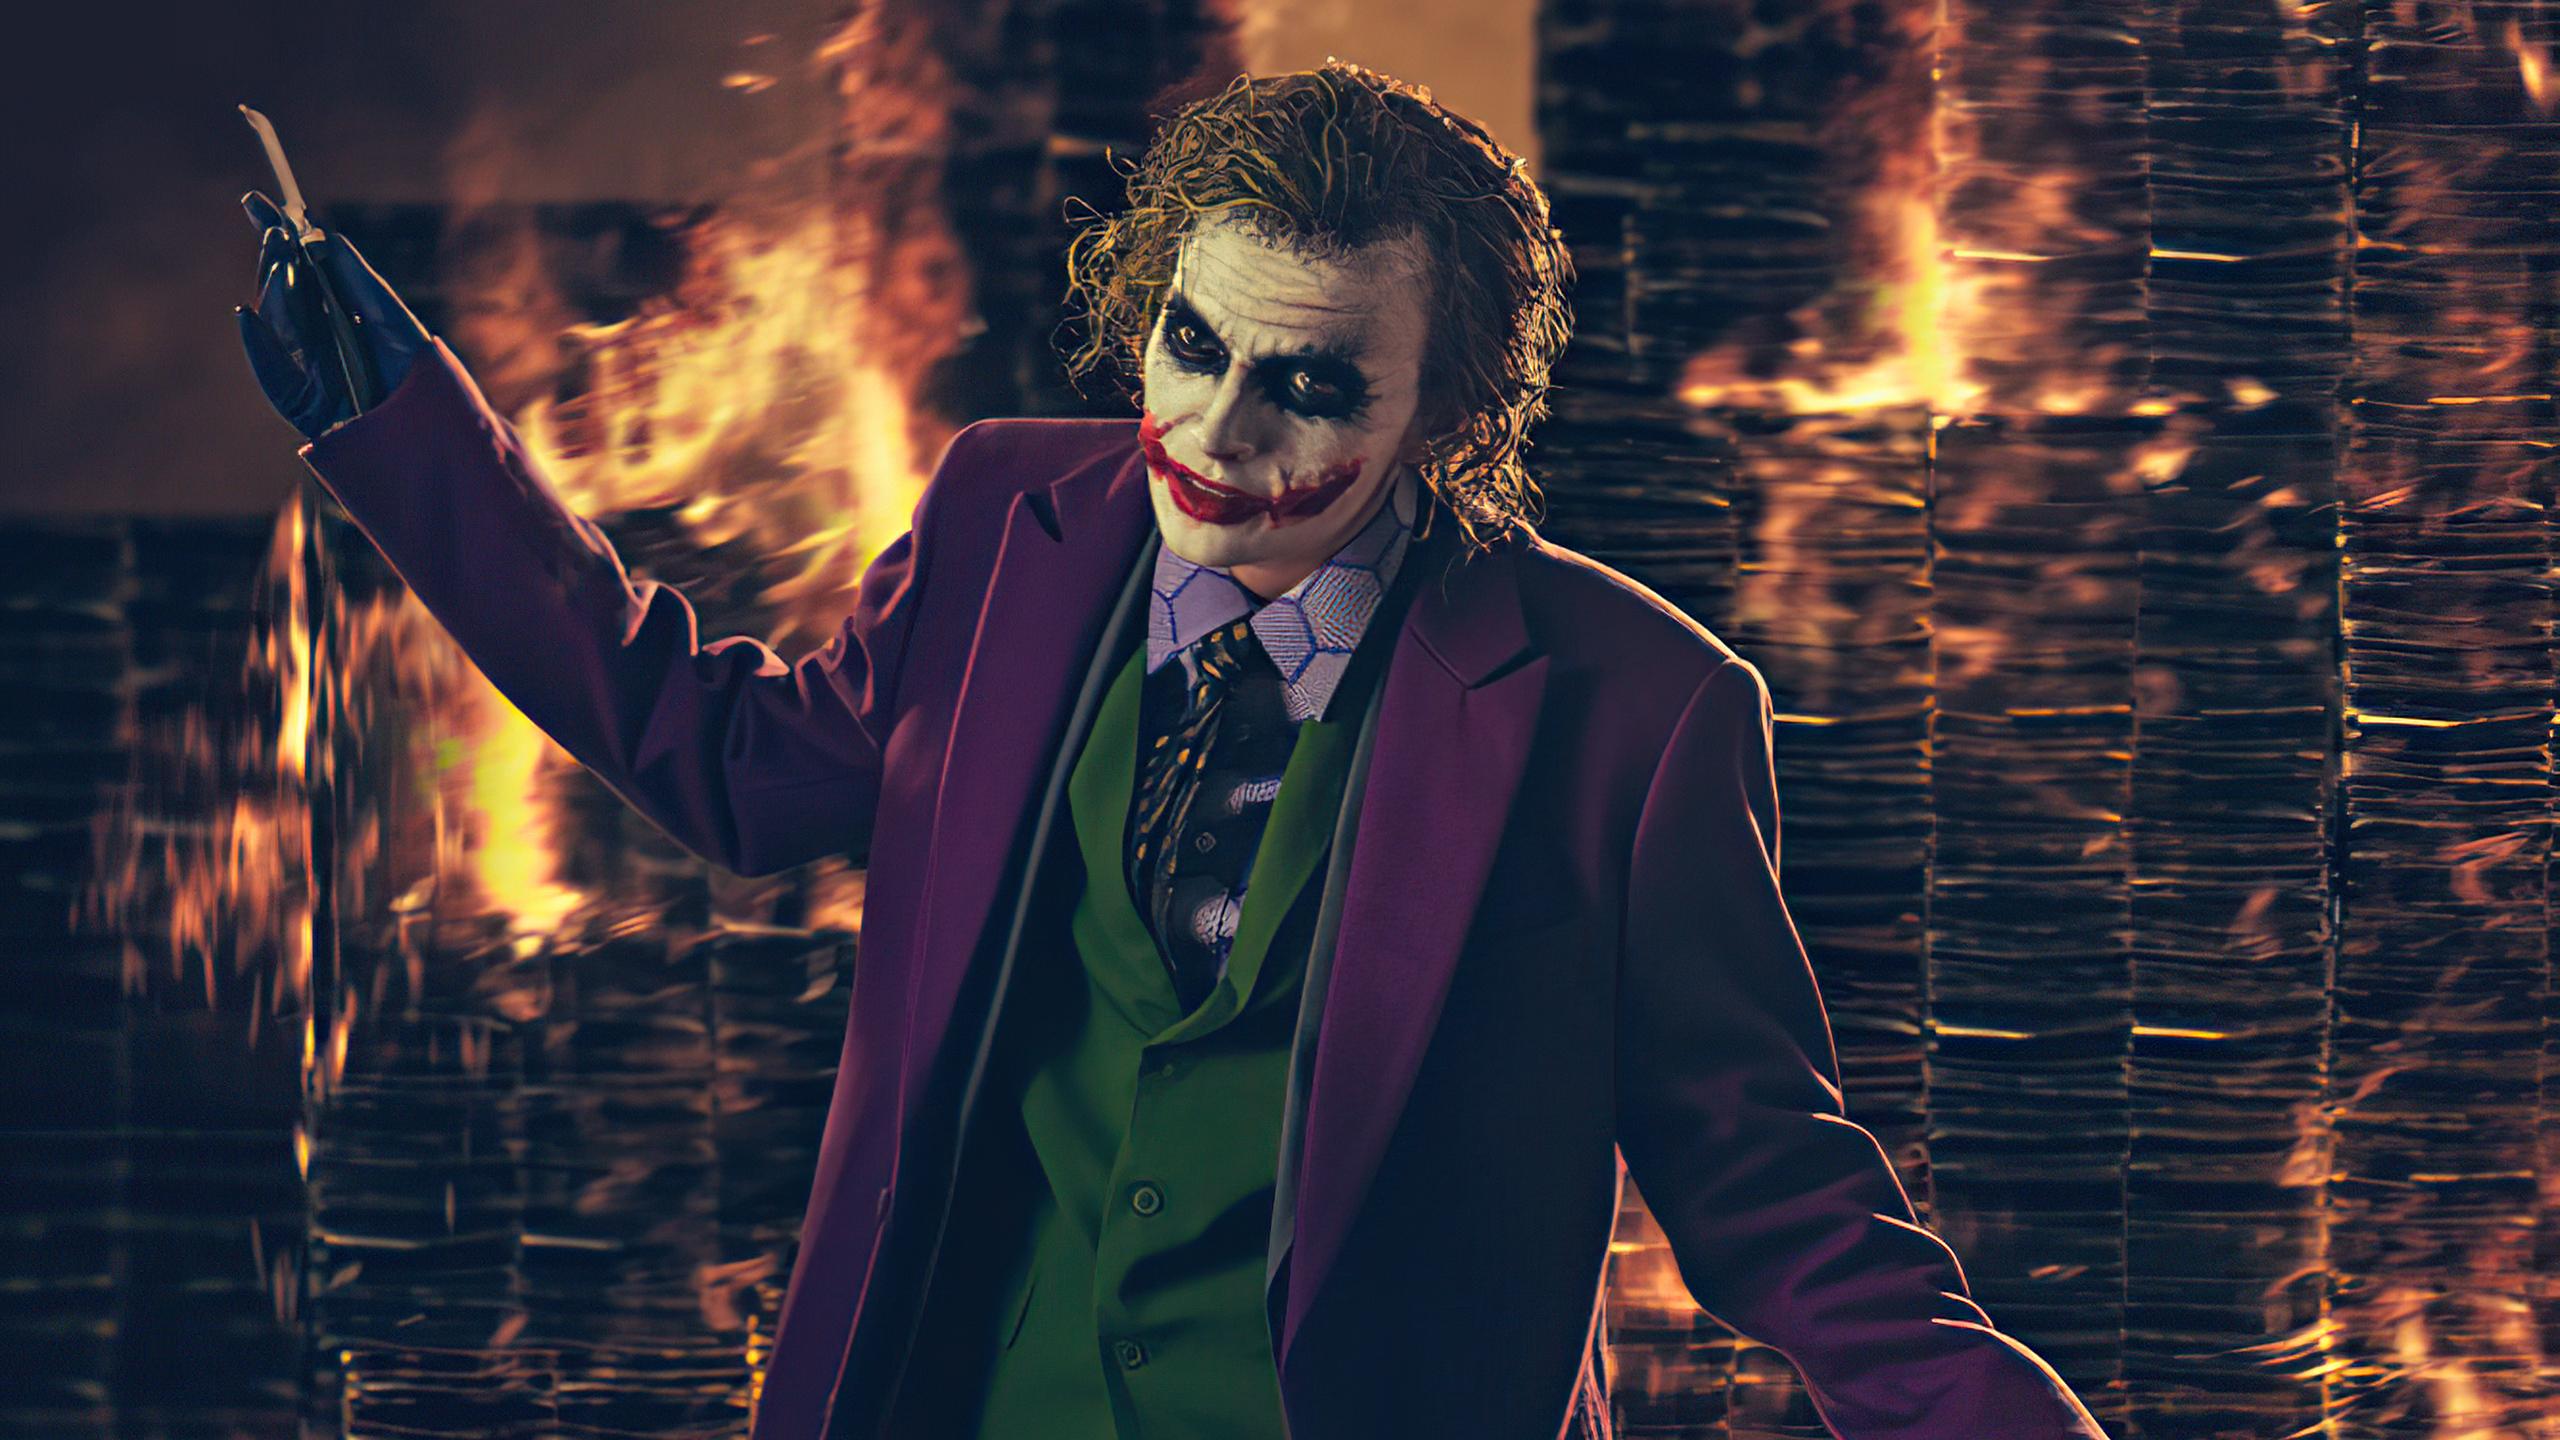 heath-ledger-joker-cosplay-burning-buildings-4k-a8.jpg